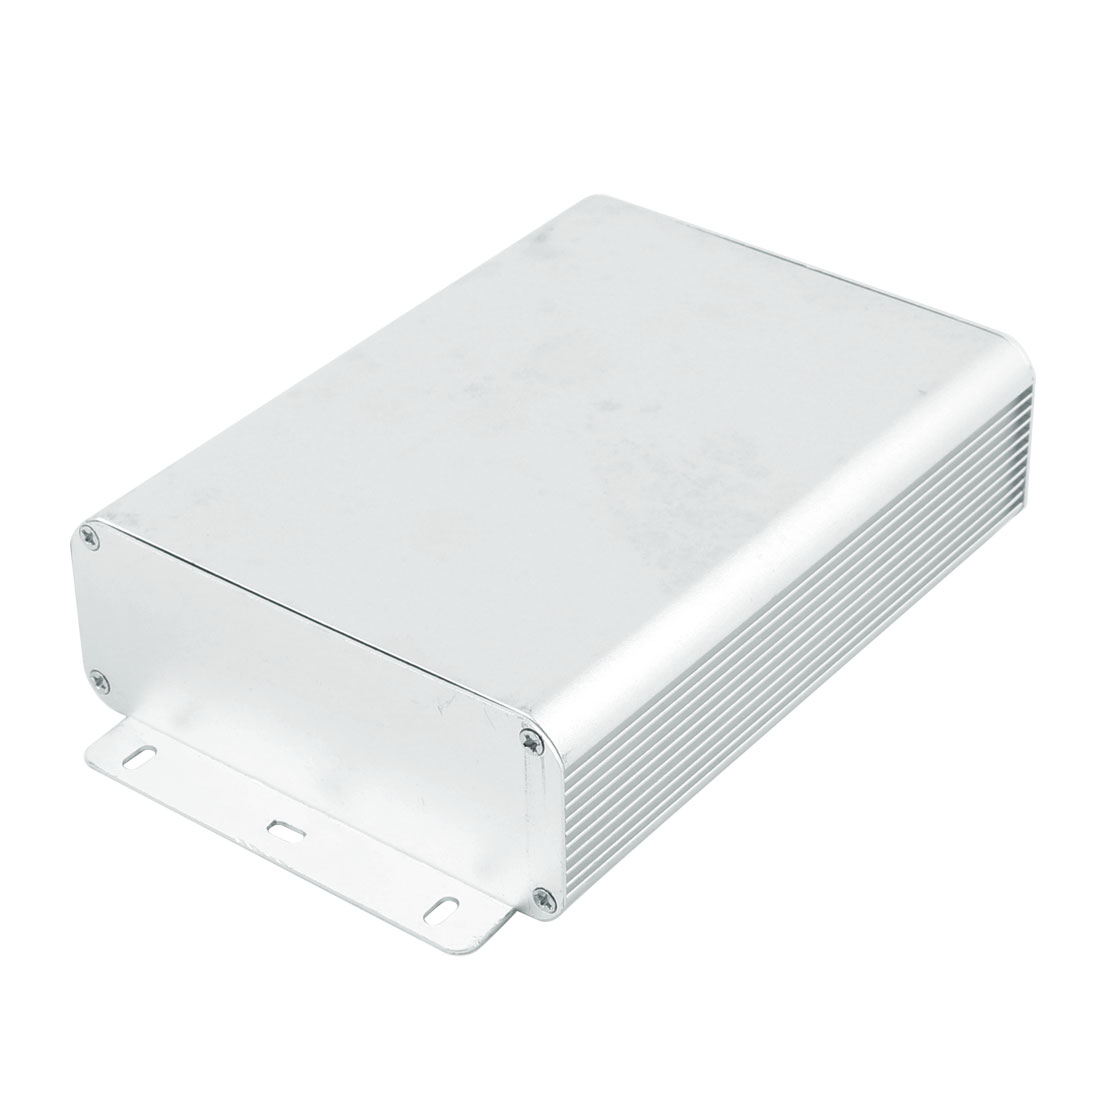 45 x 122 x 160mm Multi-purpose Extruded Aluminum Enclosure Box Silver Tone